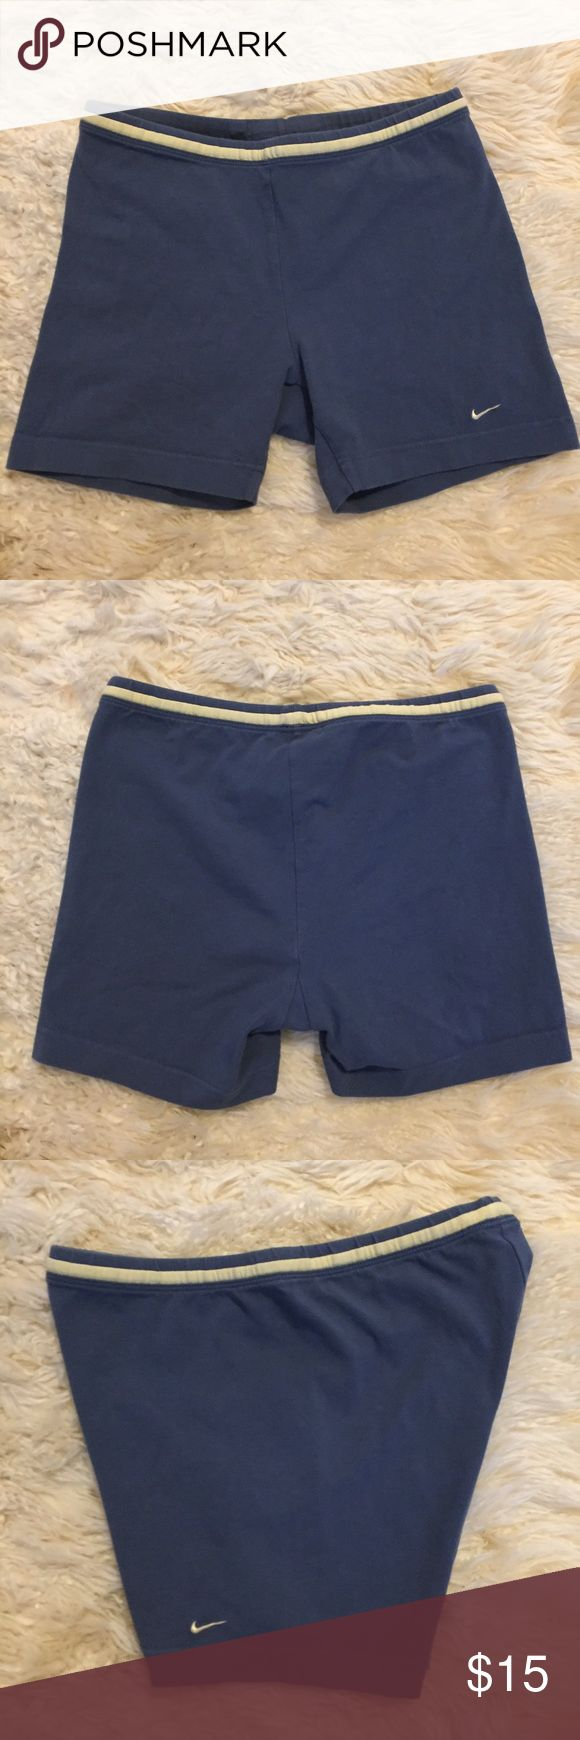 NIKE  COTTON SHORTS Gray, NIKE SHORTS.  90%cotton, 10% spandex.  Size M.  Pre owned, good condition, pet/smoke free home Nike Shorts